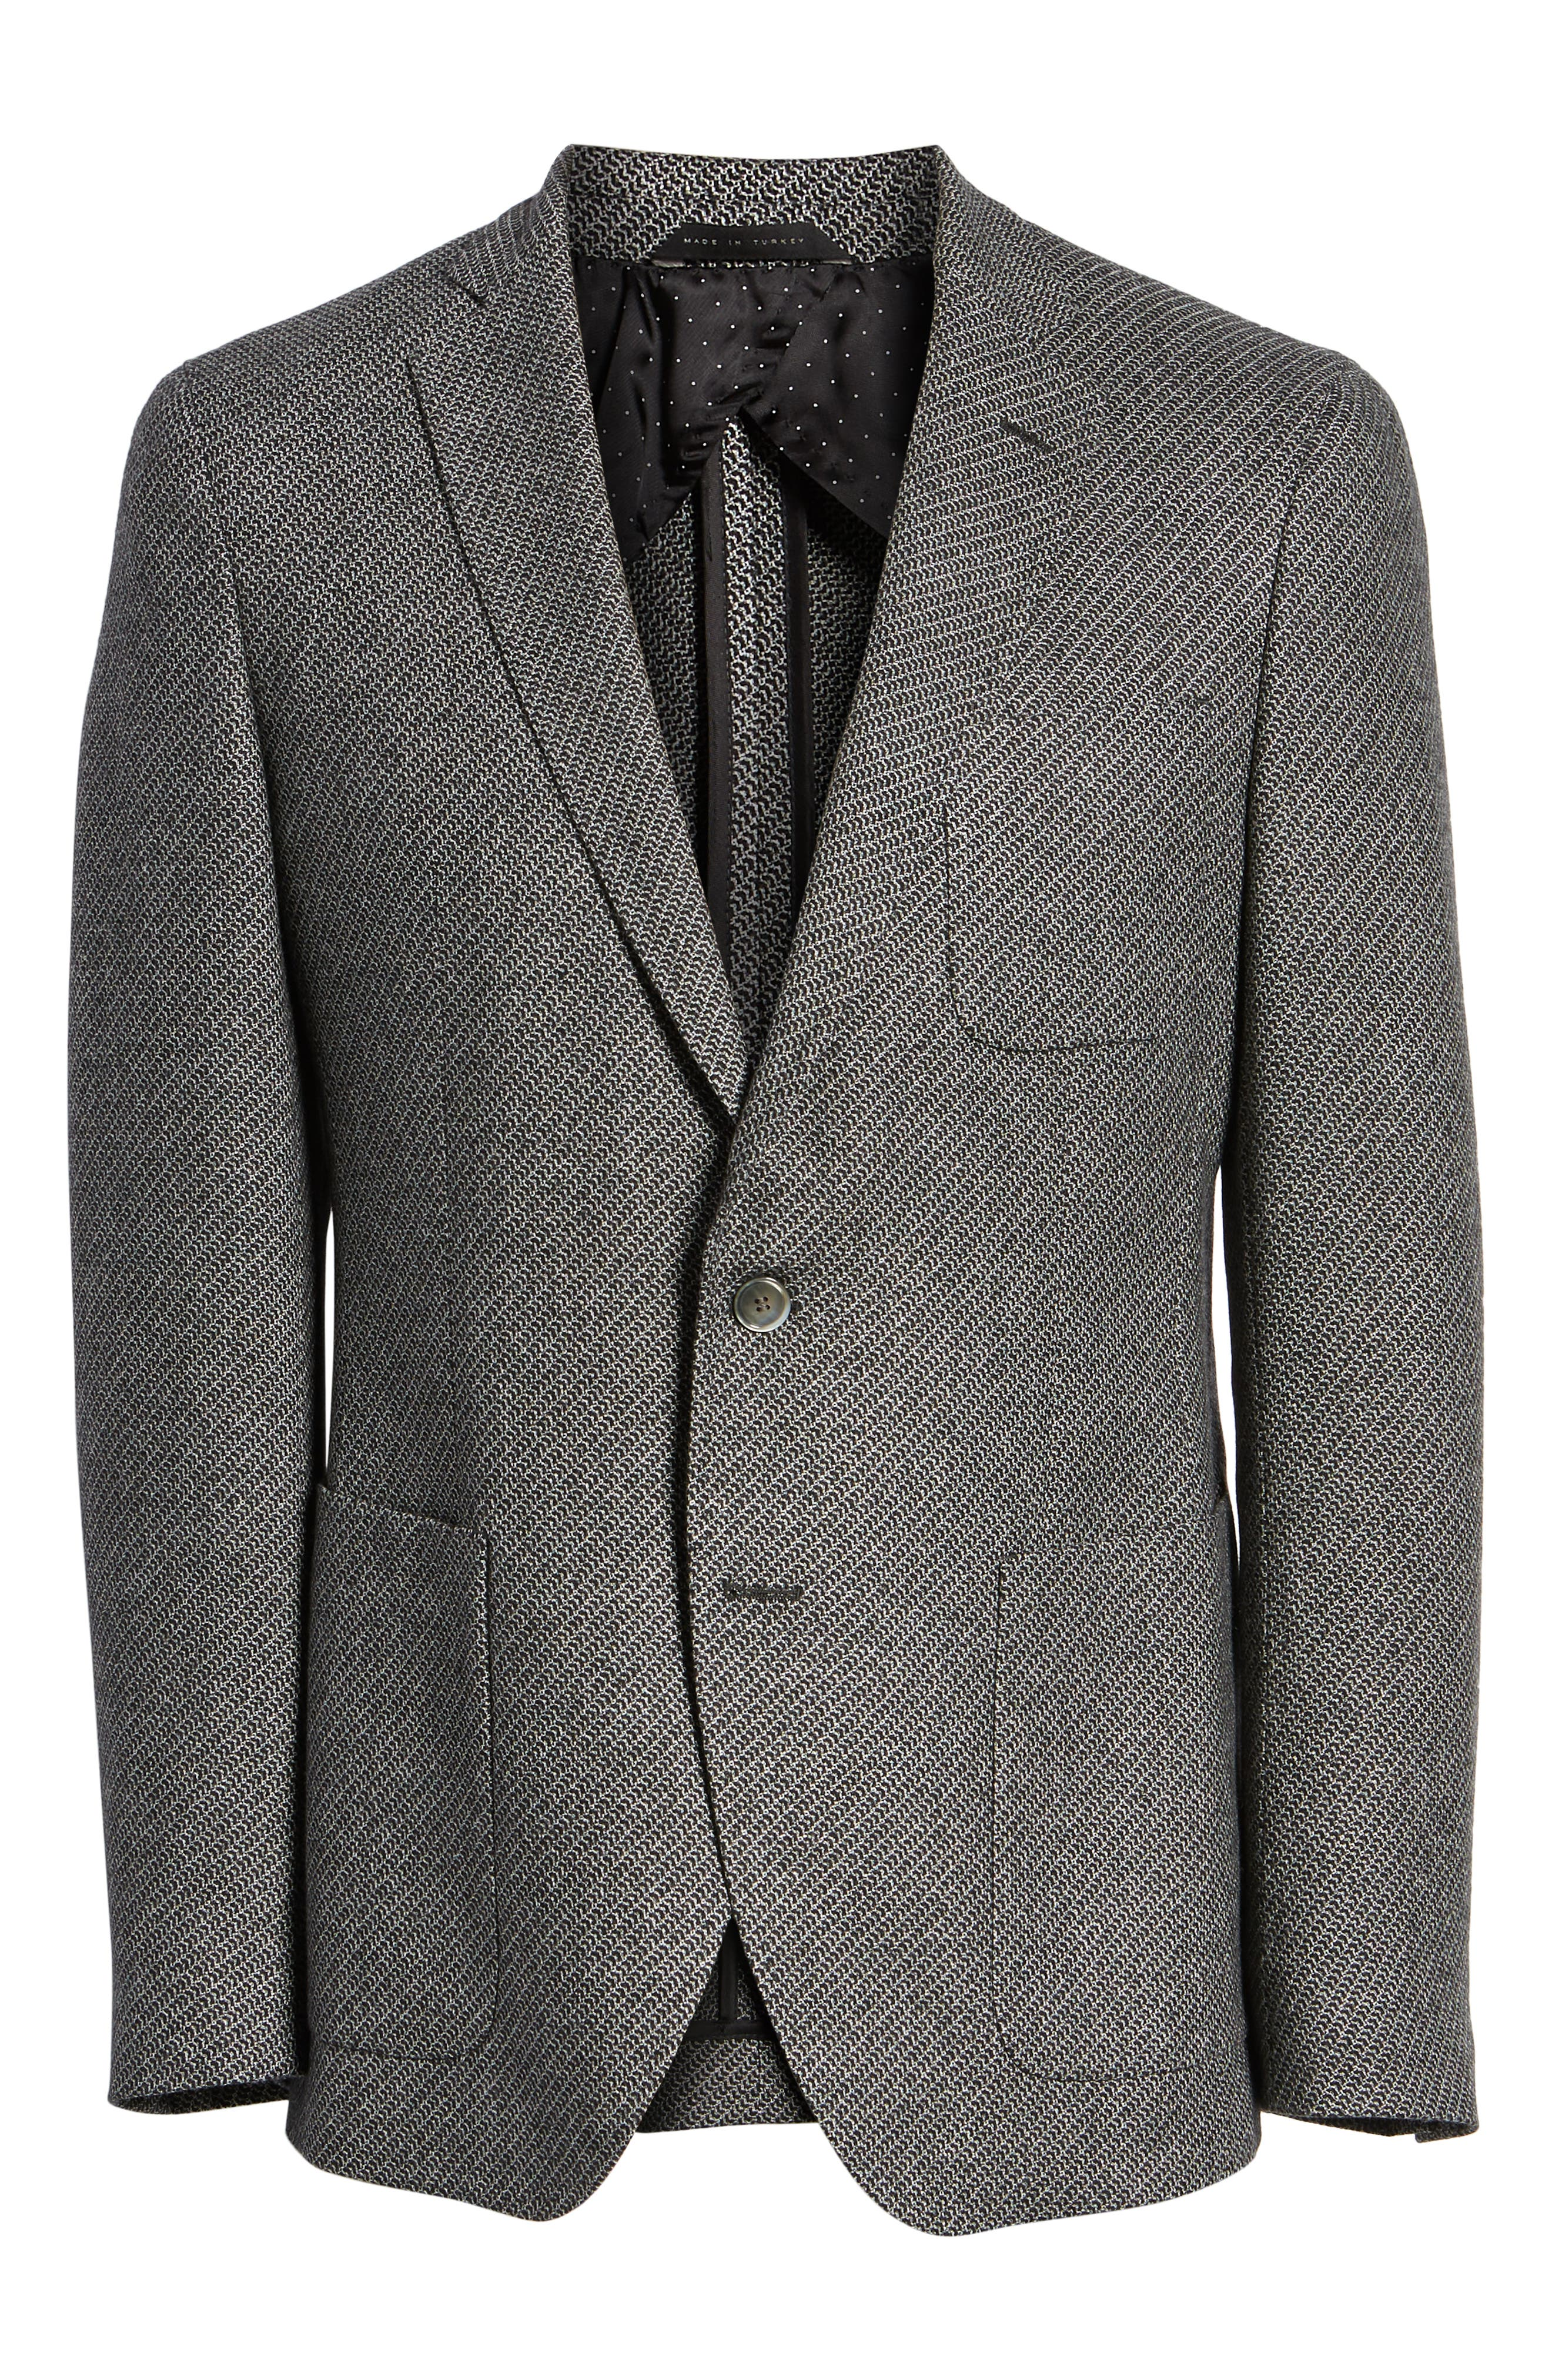 Raye Extra Trim Fit Wool Blend Blazer,                             Alternate thumbnail 5, color,                             DARK GREY